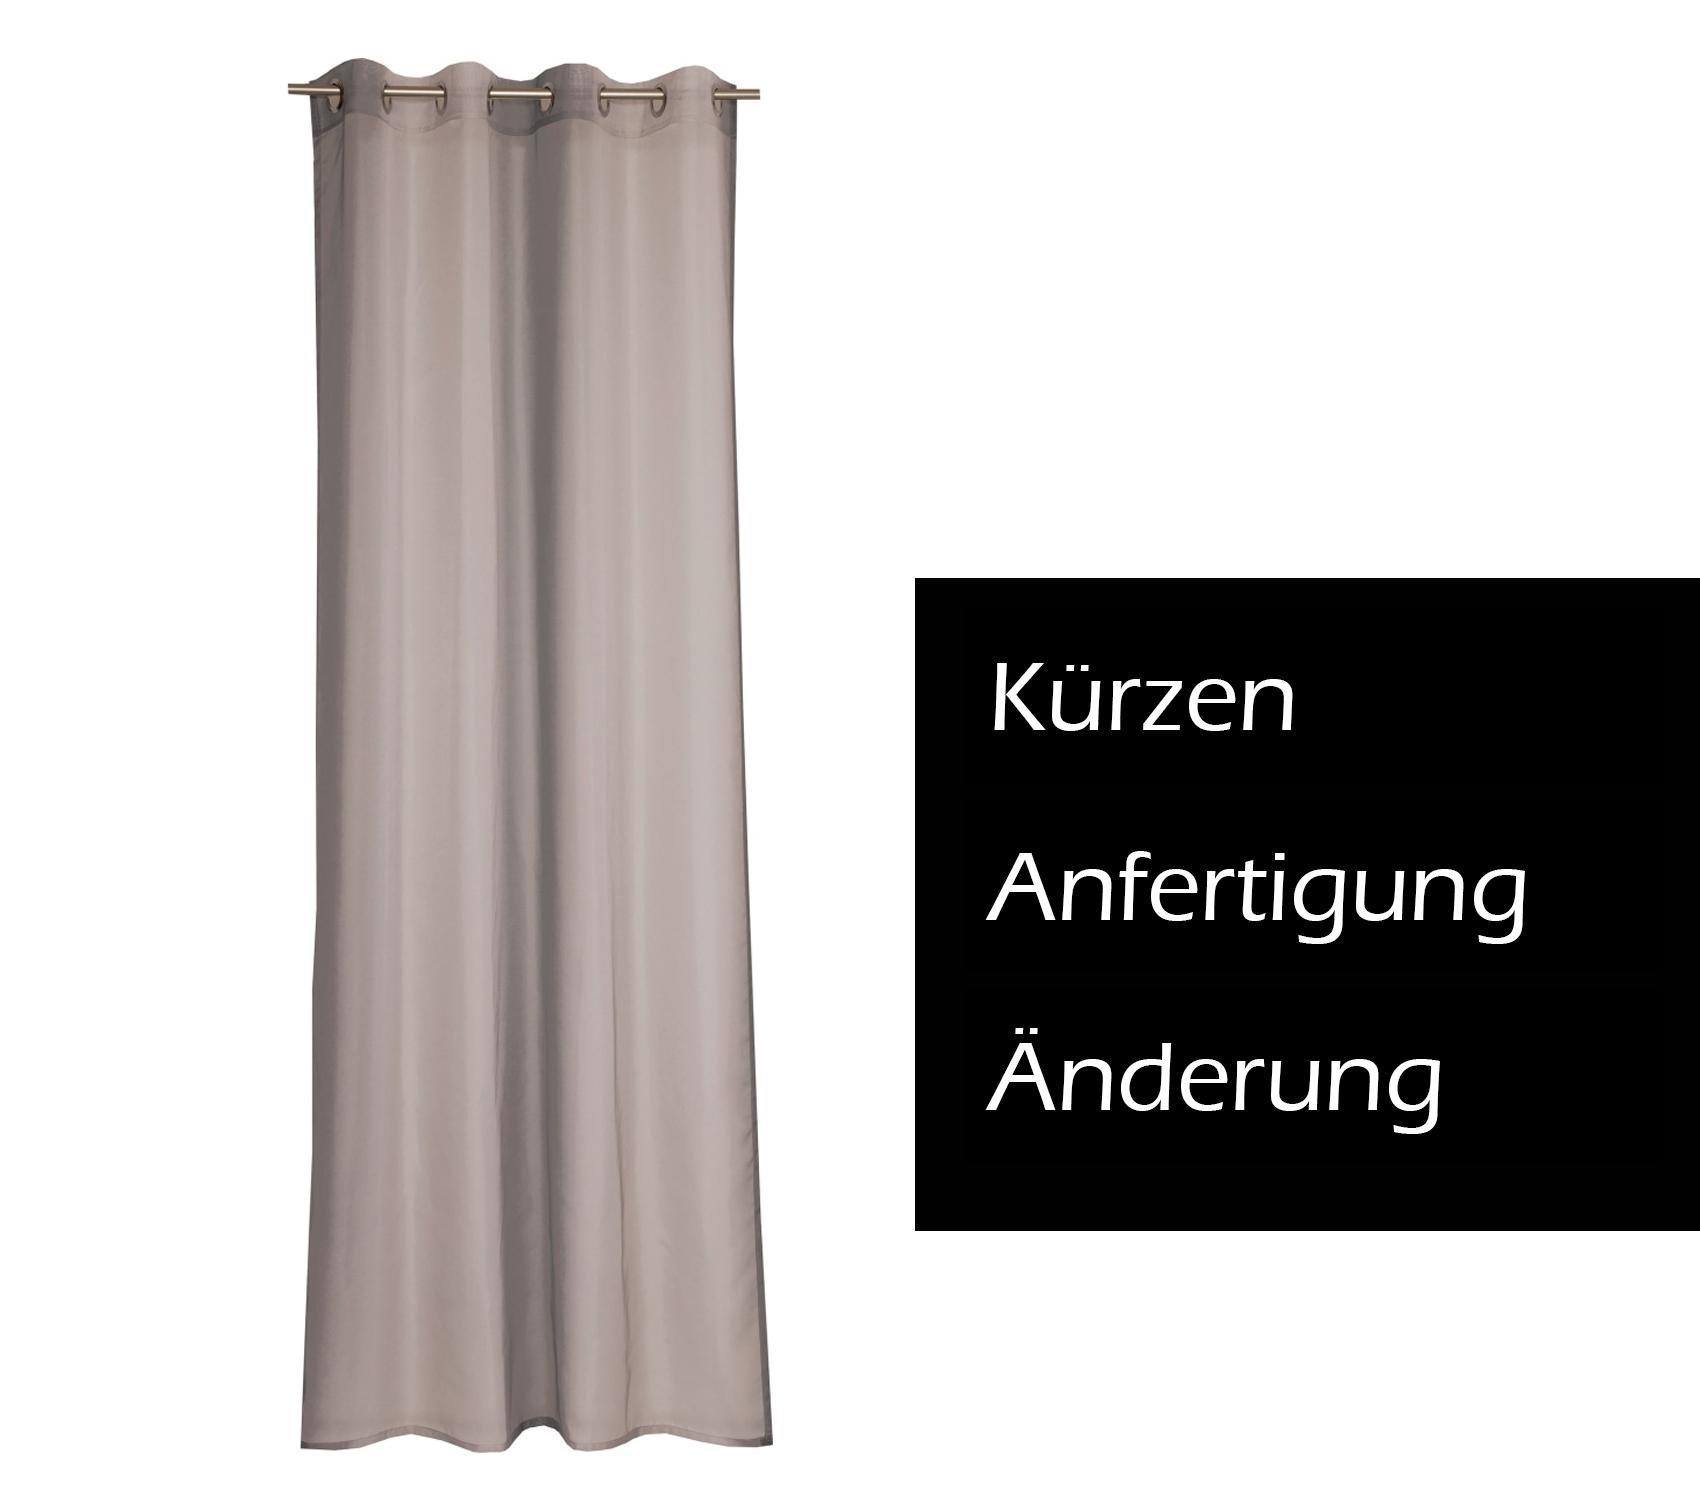 Gardinen/ Vorhang kürzen,Gardinen nähen, Gardinen ändern, Vorhang nähen, Vorhang ändern, Kräuselband, Faltenband, Gardine nach Maß, Gardine reparieren,